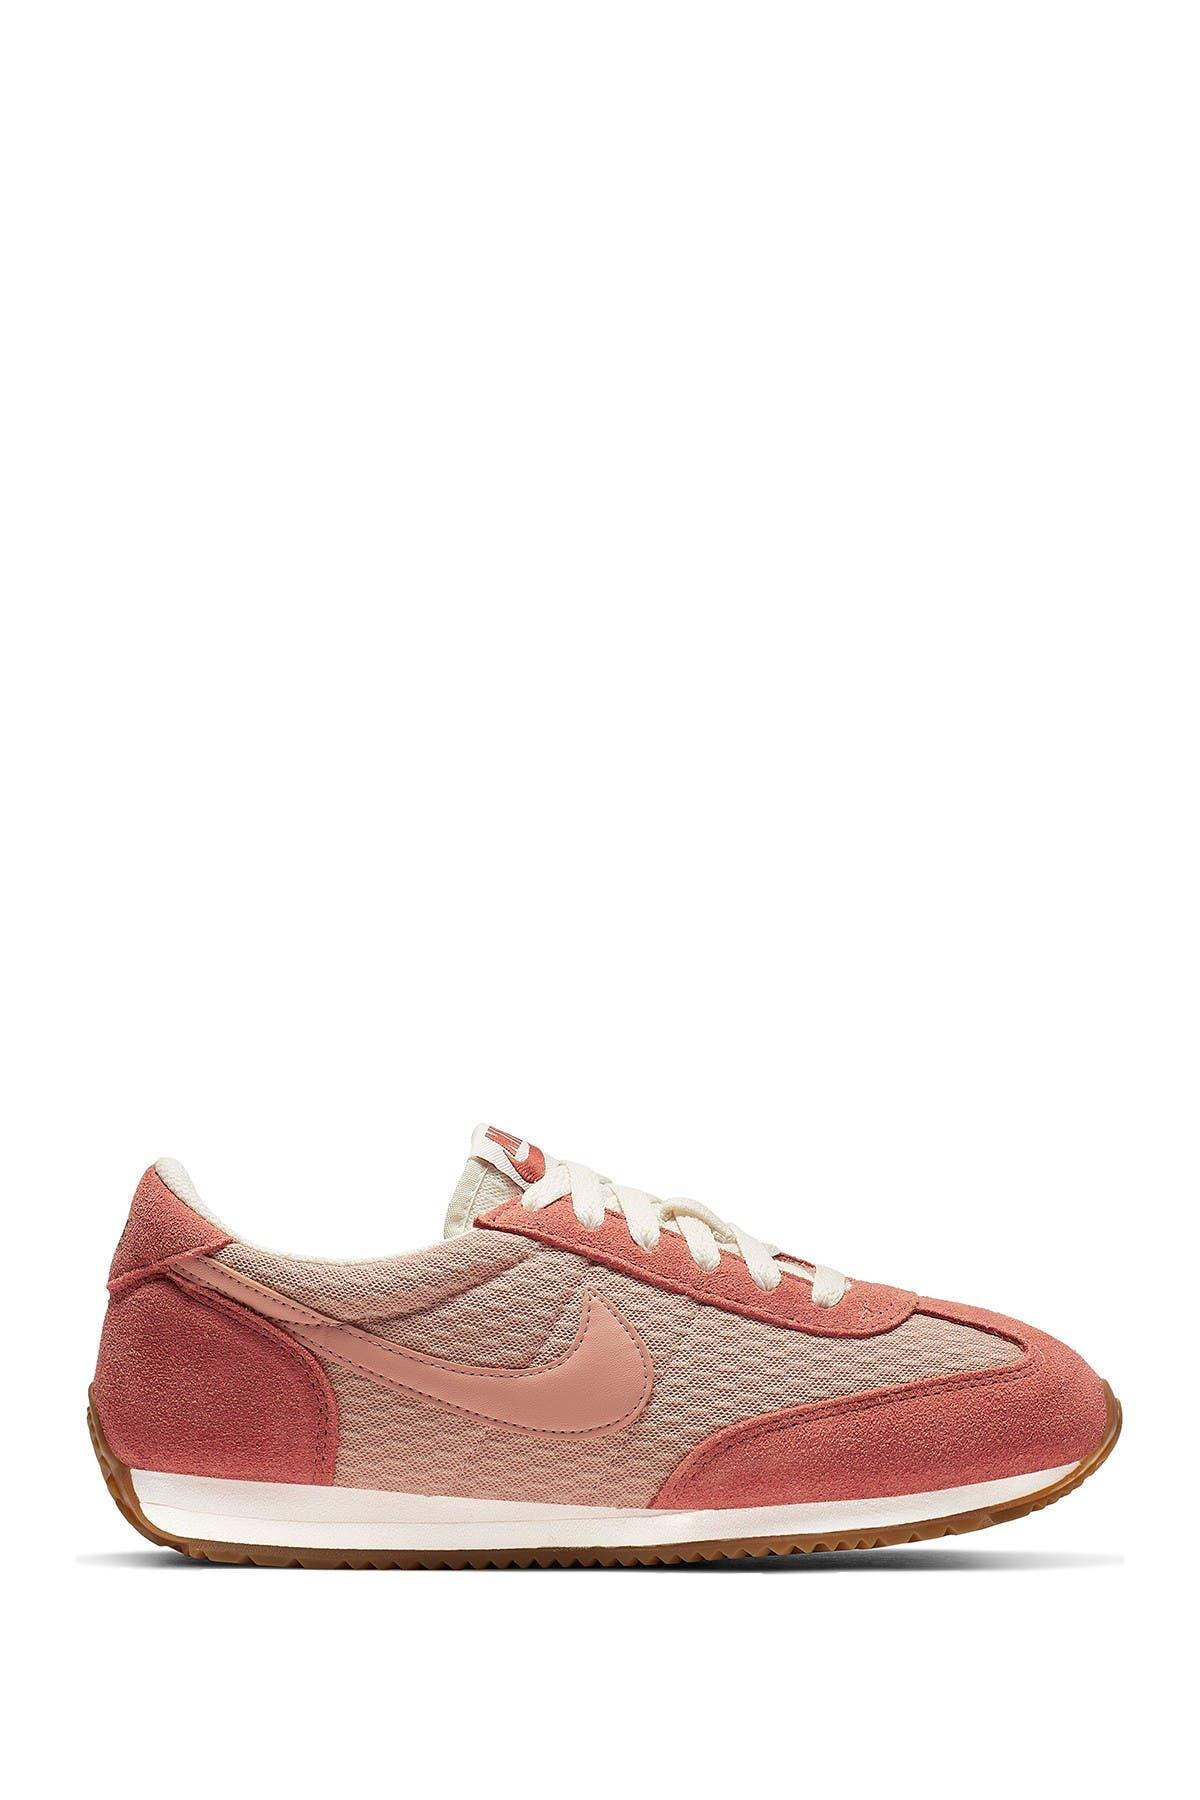 Nike   Oceania Textile Sneaker